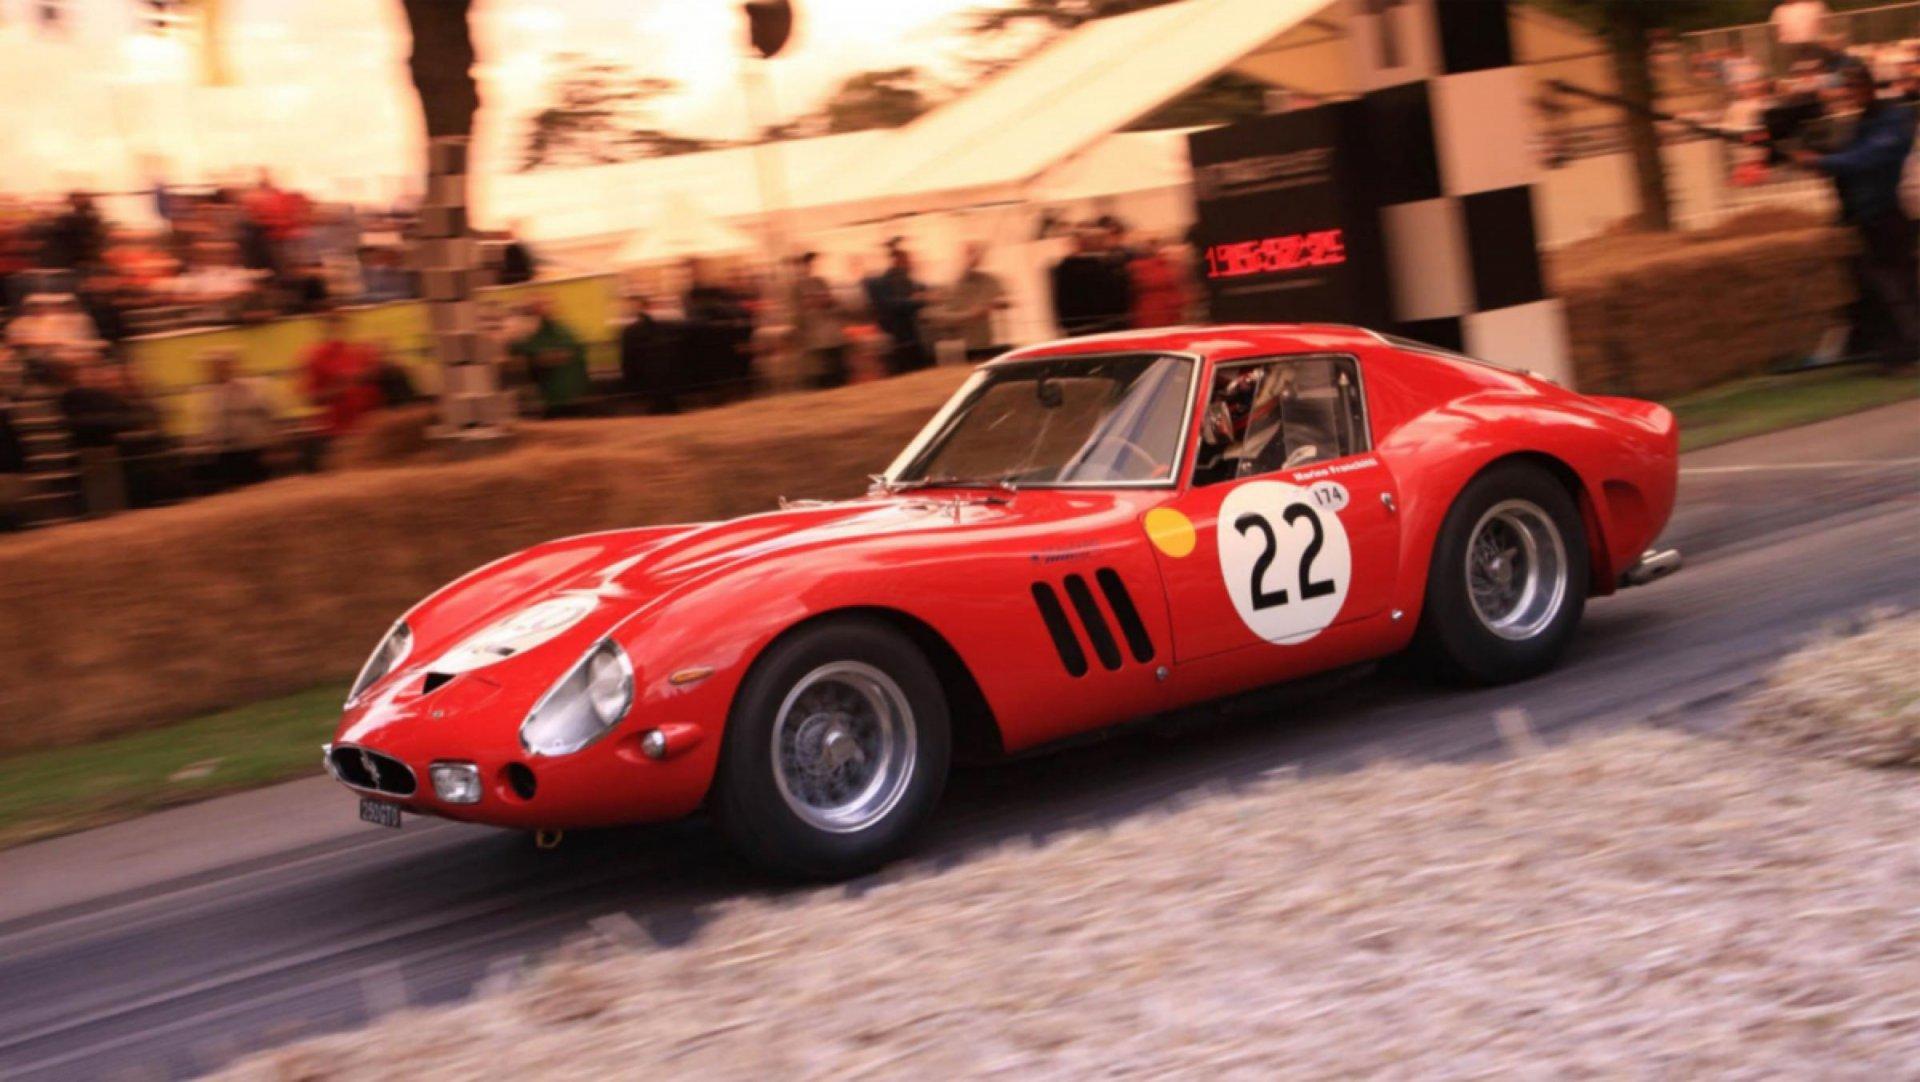 El Ferrari 250 GTO se enfrenta cara a cara al Maserati Tipo 151 en pista